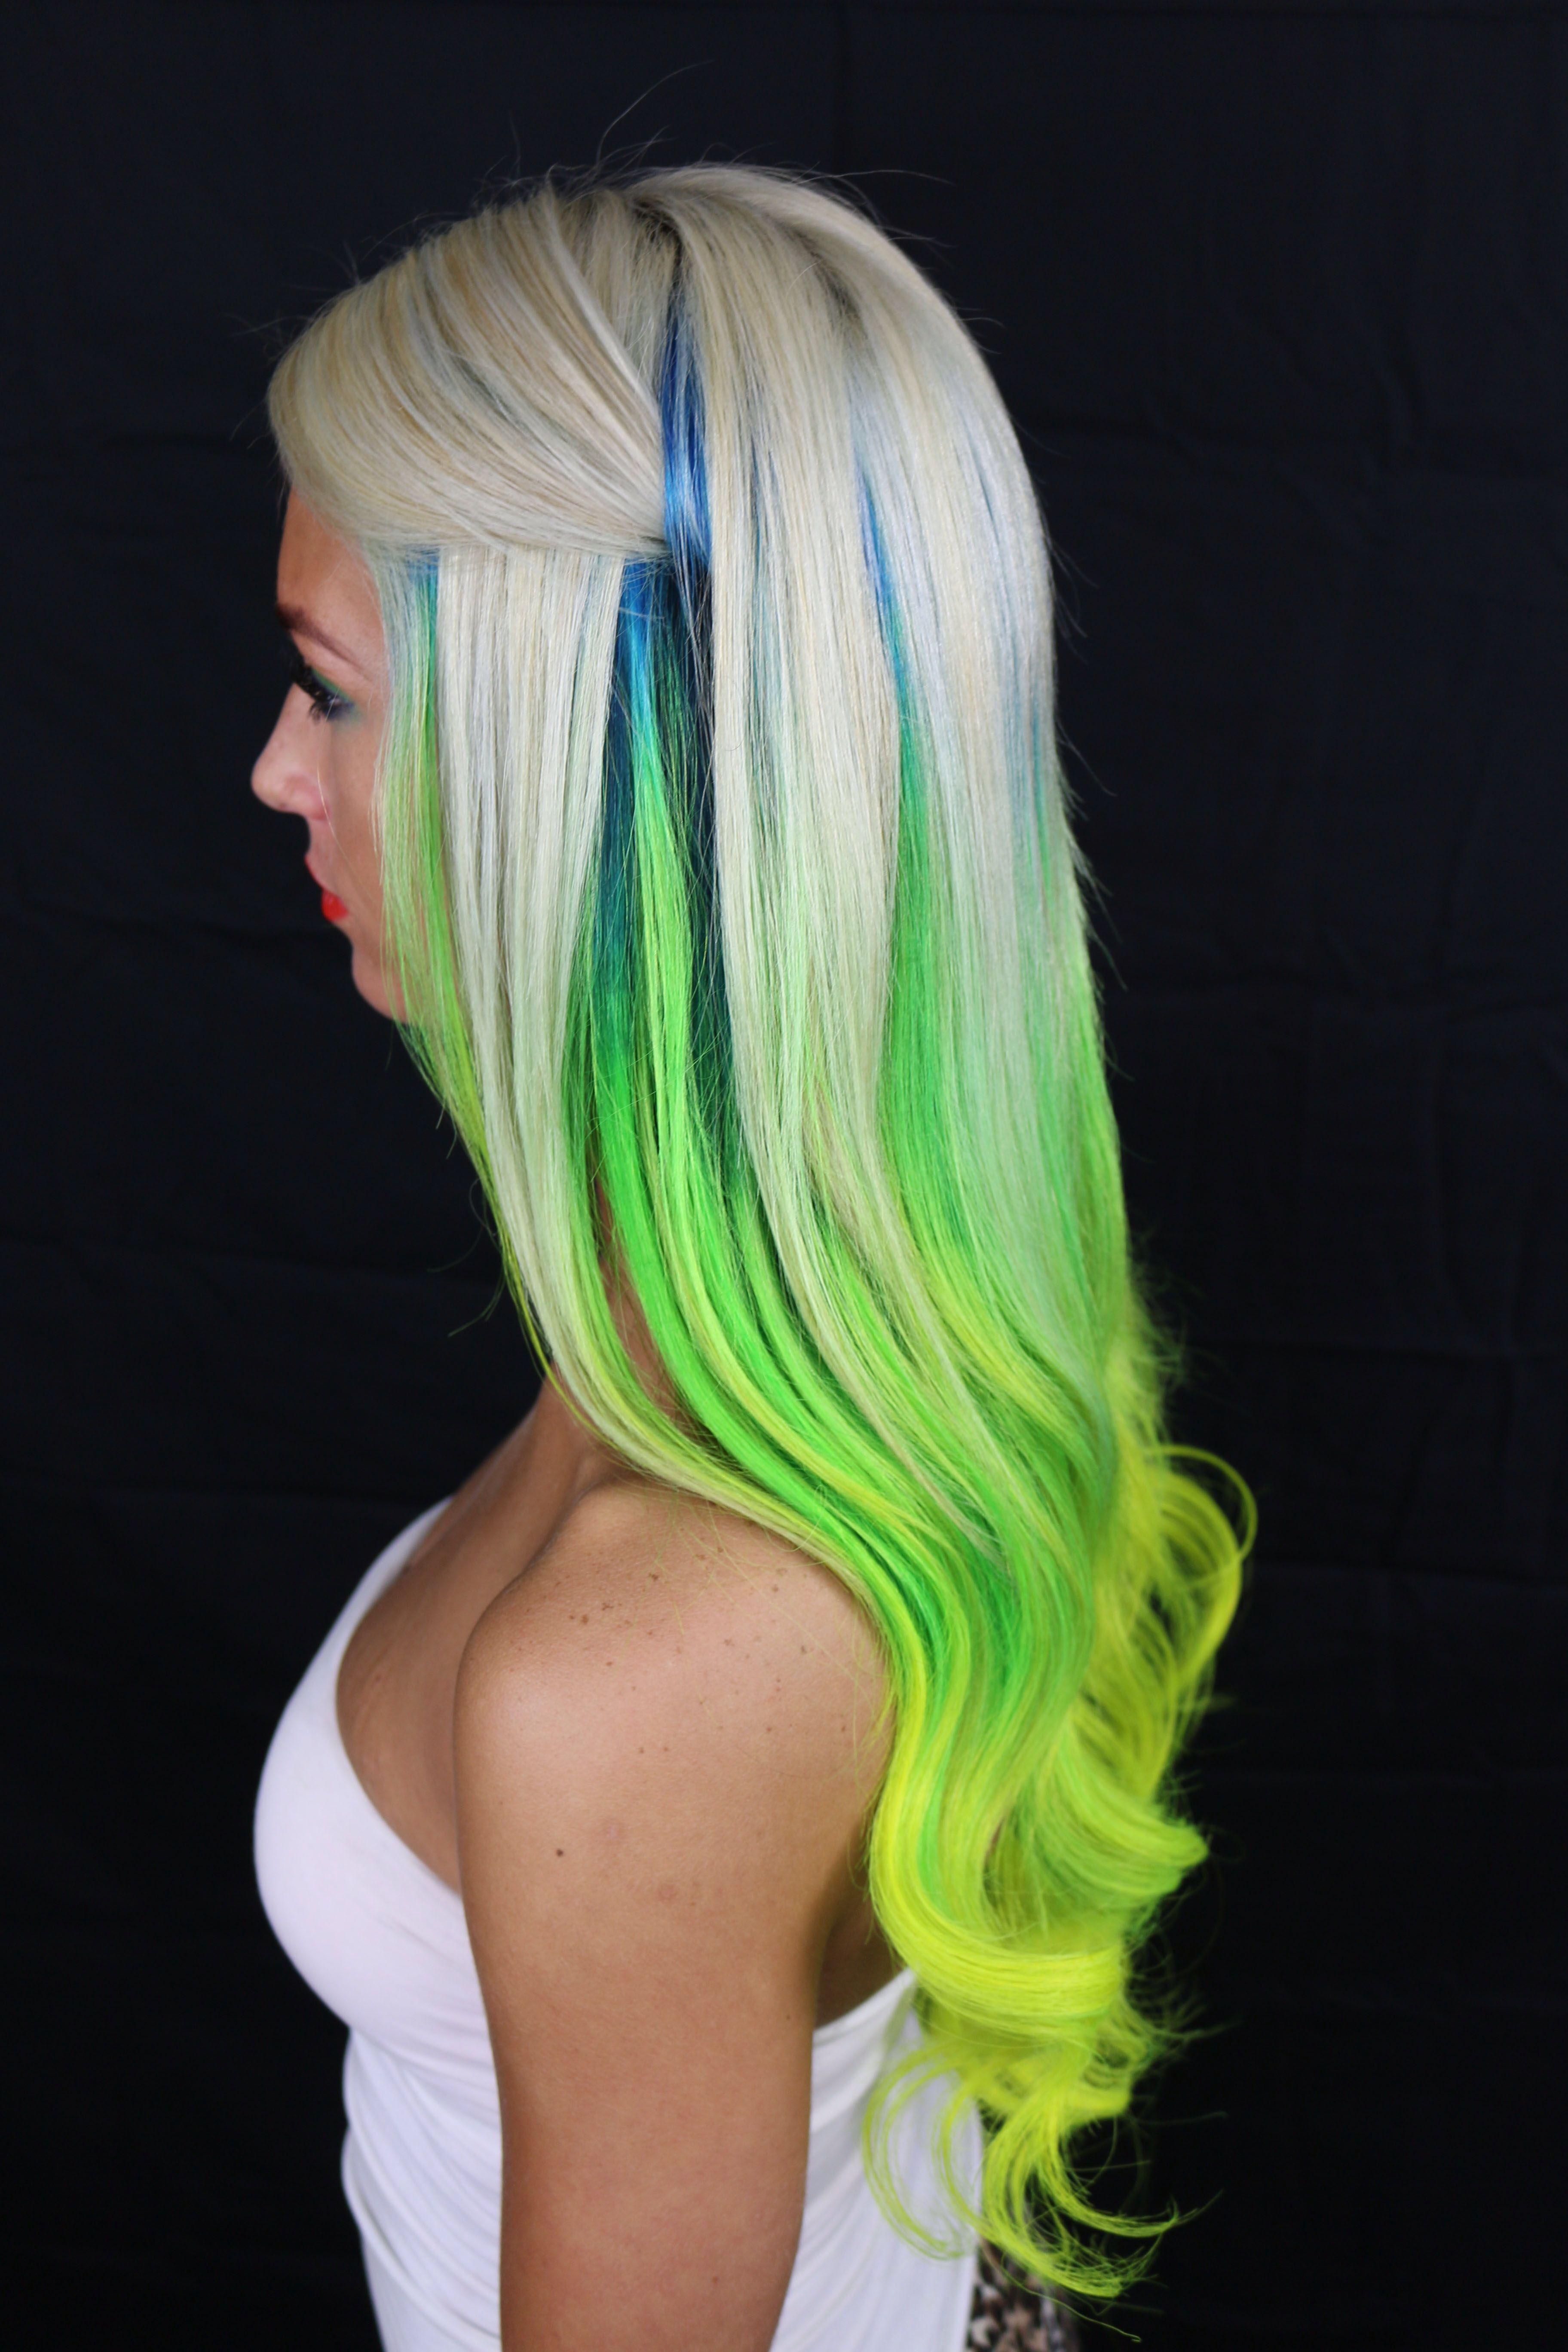 Best Emerald Green Hair Dye Set   Neon green, Neon yellow and Neon